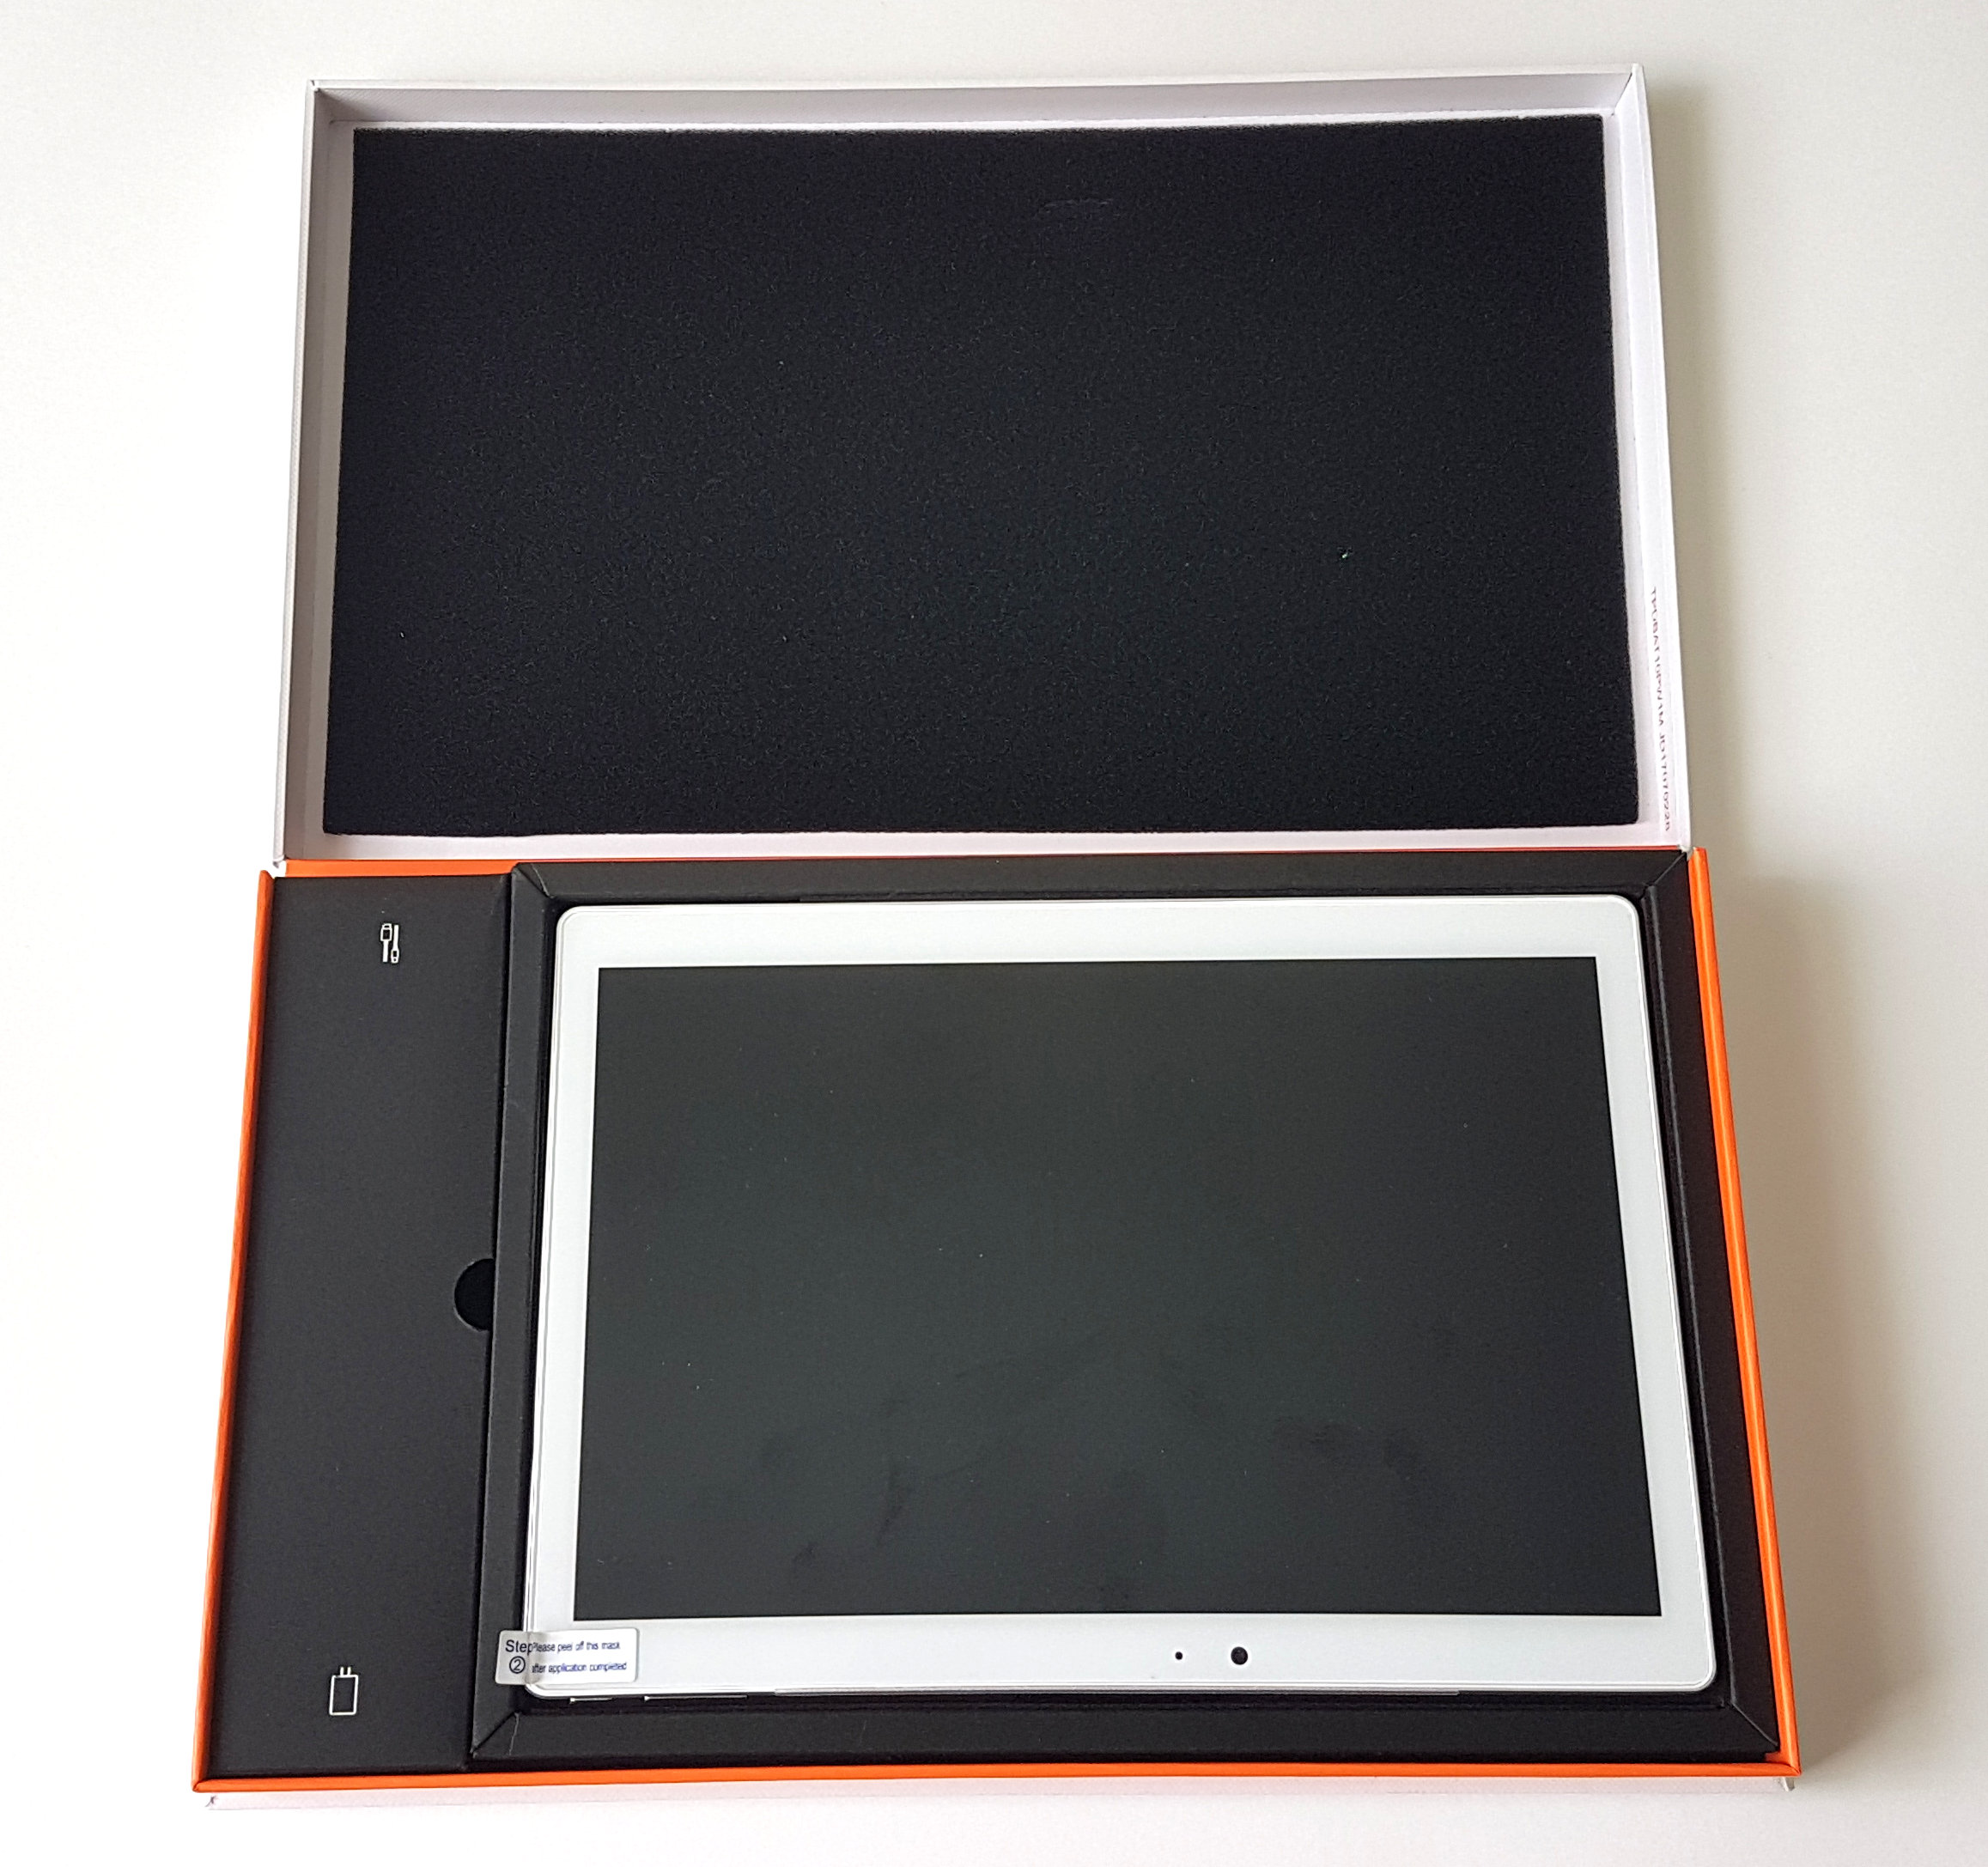 teclast-master-t10-64gb-10-colos-tablet-teszt-doboz-02.jpg